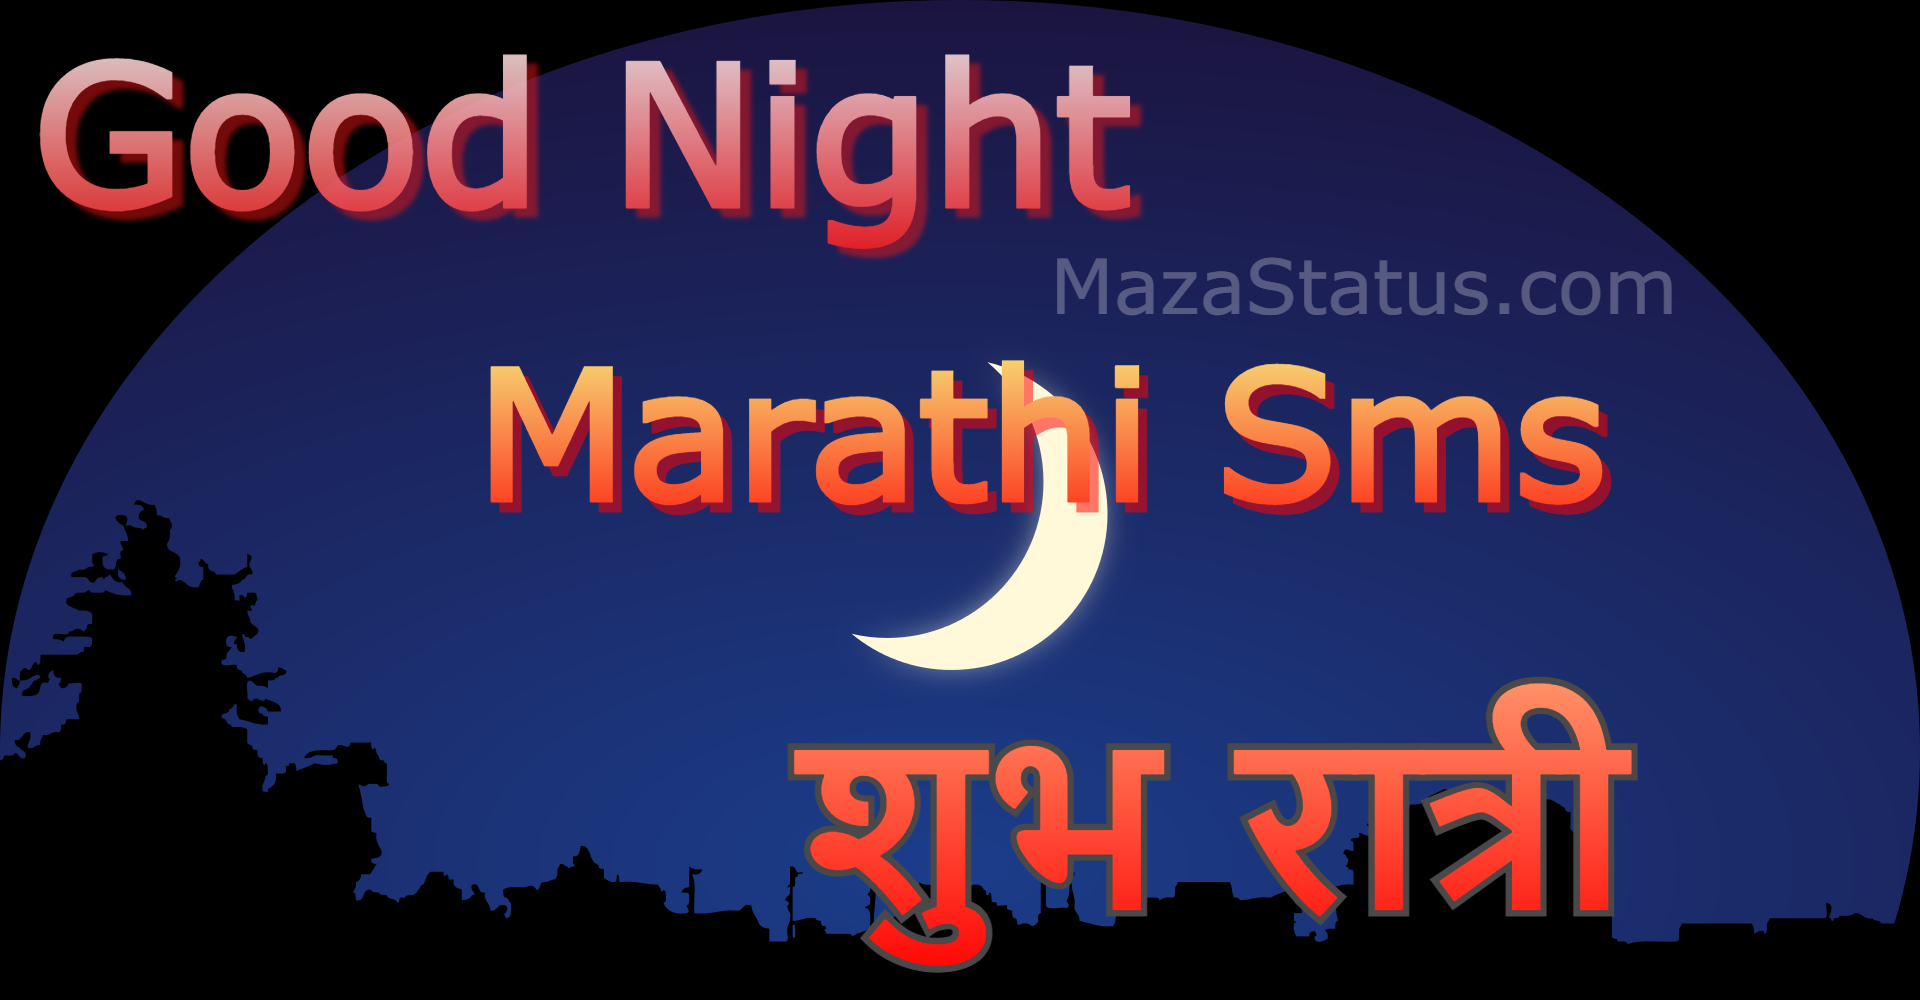 Good night message in marathi